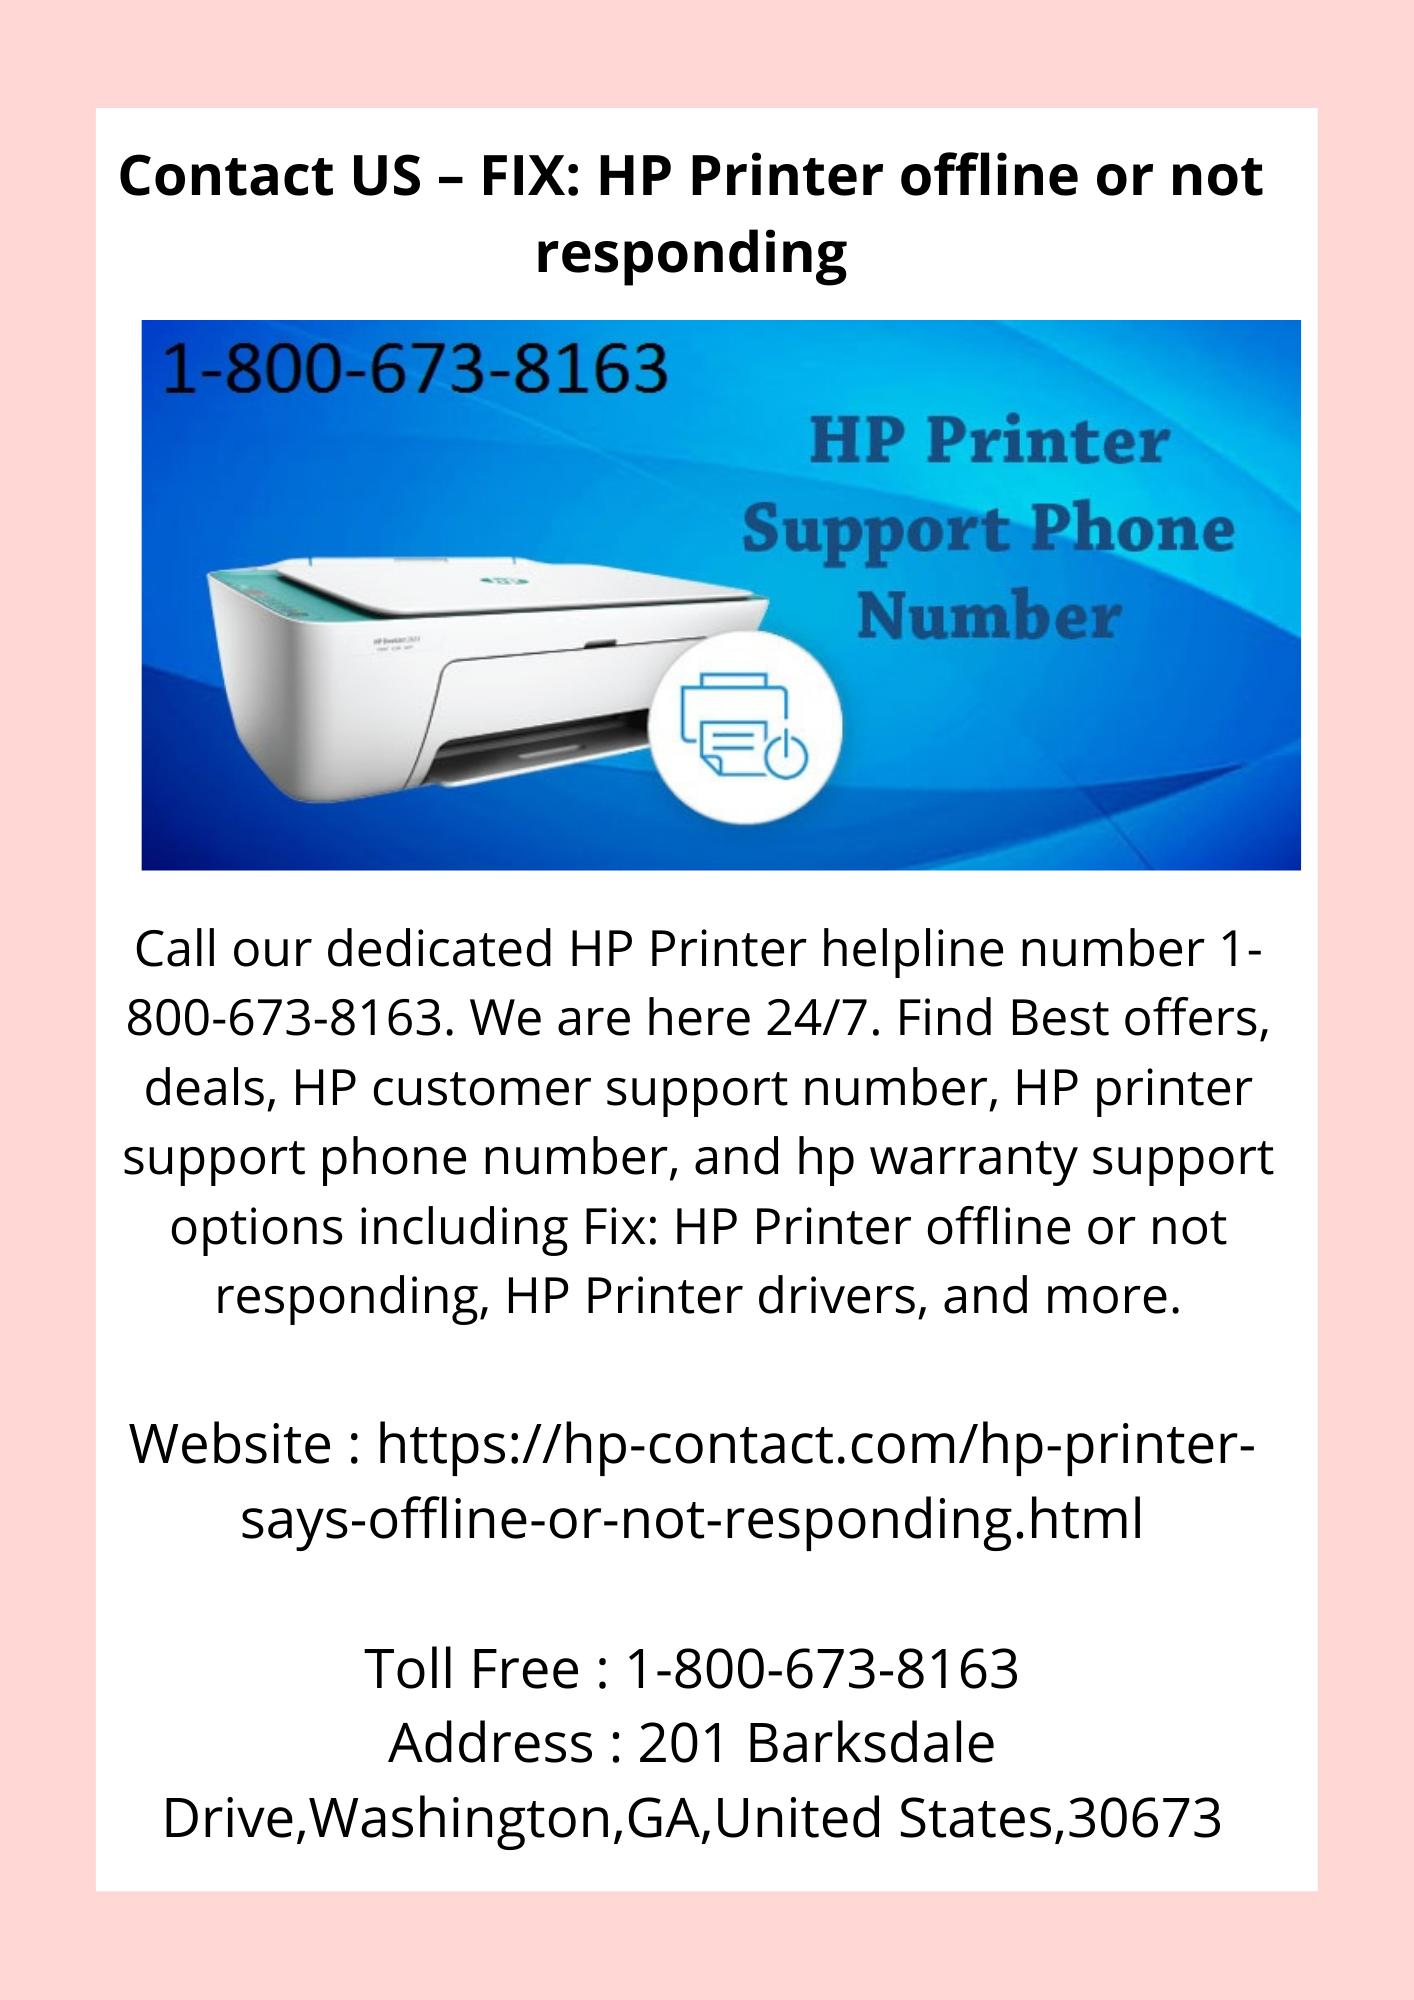 Contact US – FIX HP Printer offline or not responding